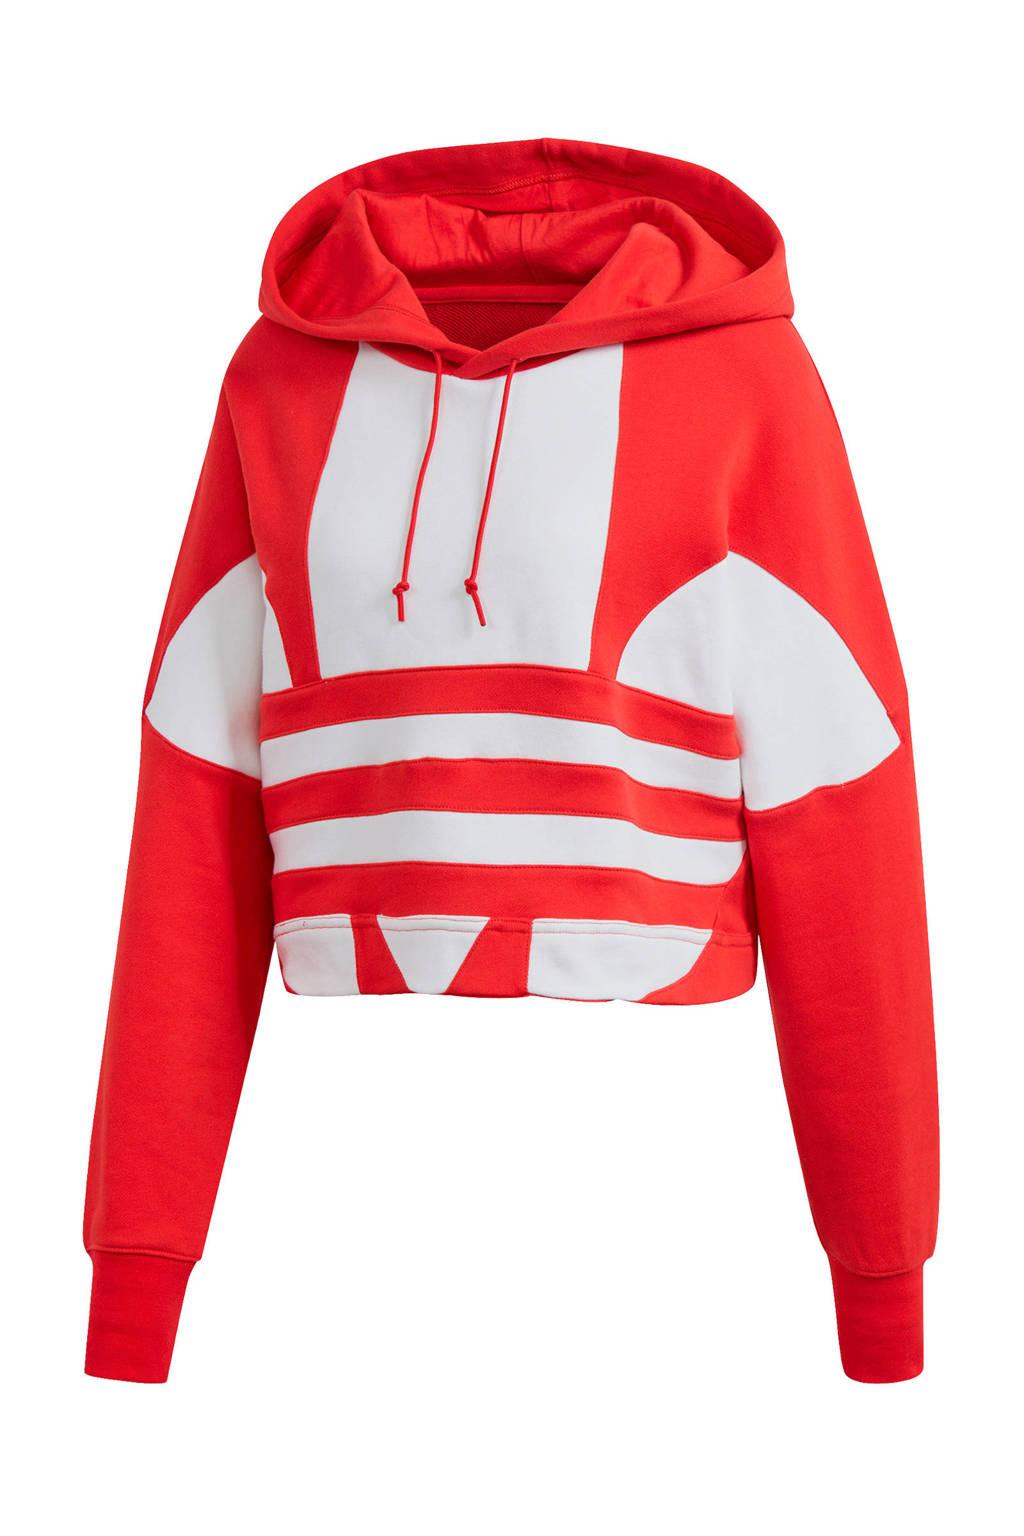 adidas Originals Adicolor cropped hoodie rood/wit, Rood/wit